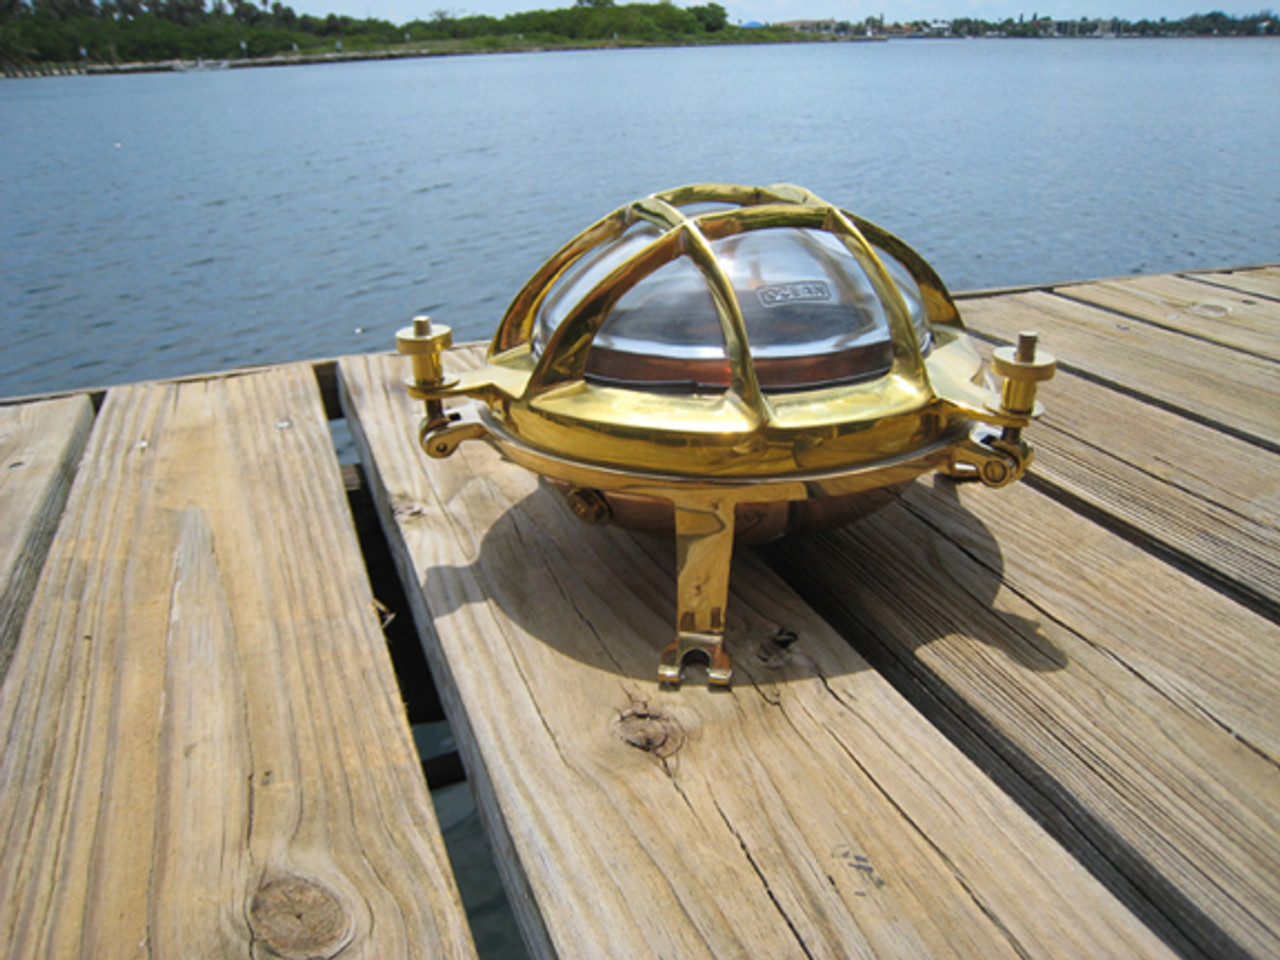 brass and copper marine bulkhead sconce light